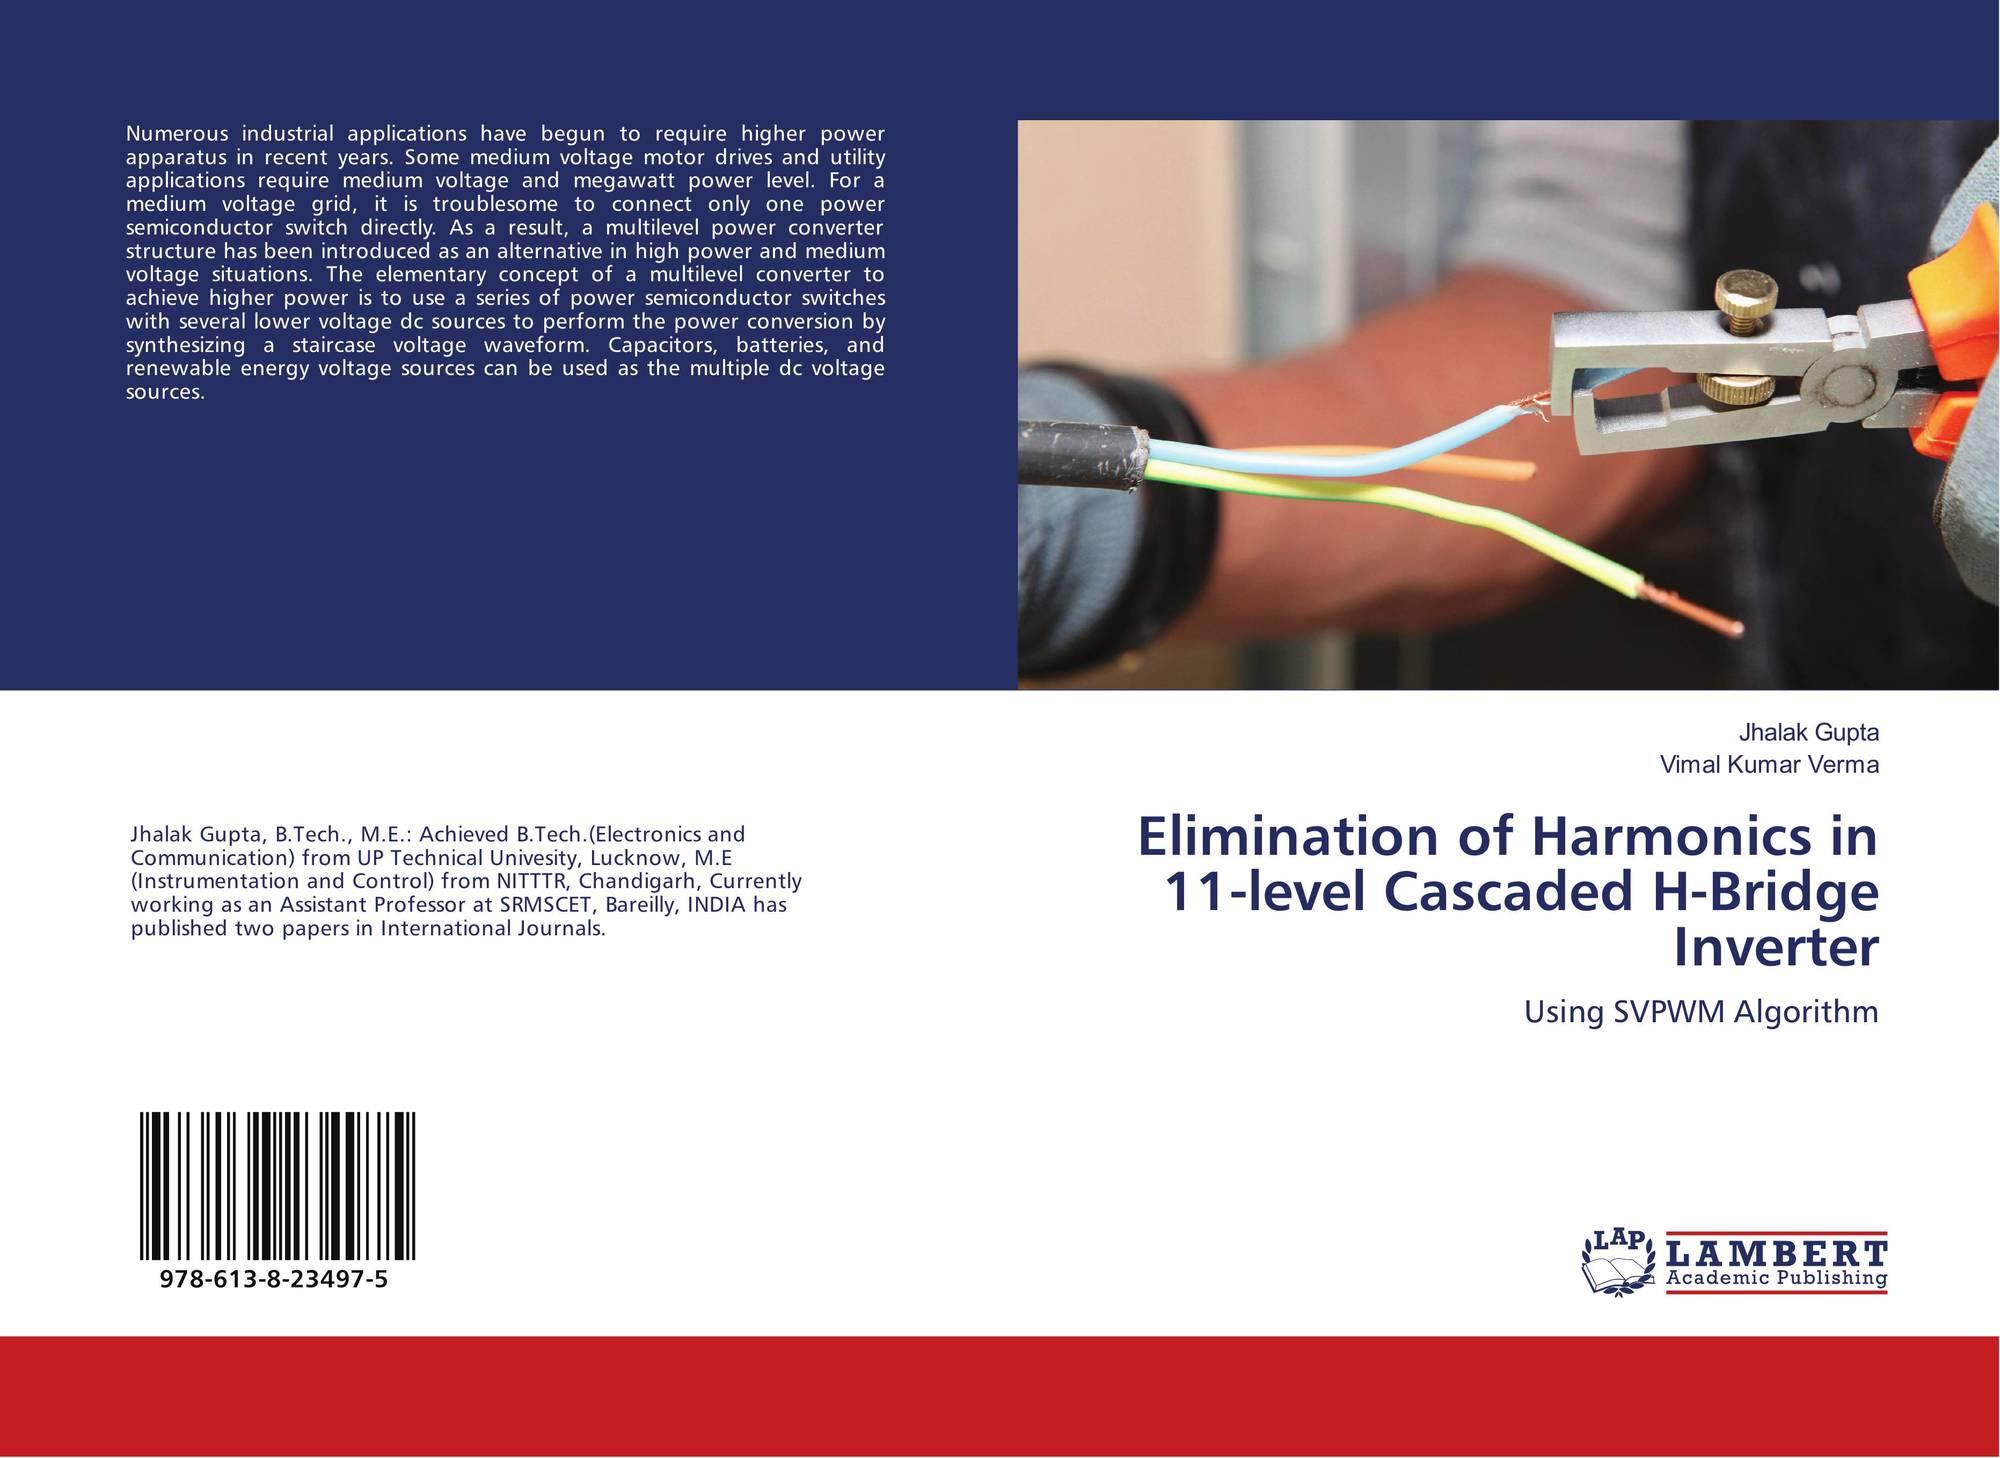 Elimination of Harmonics in 11-level Cascaded H-Bridge Inverter, 978